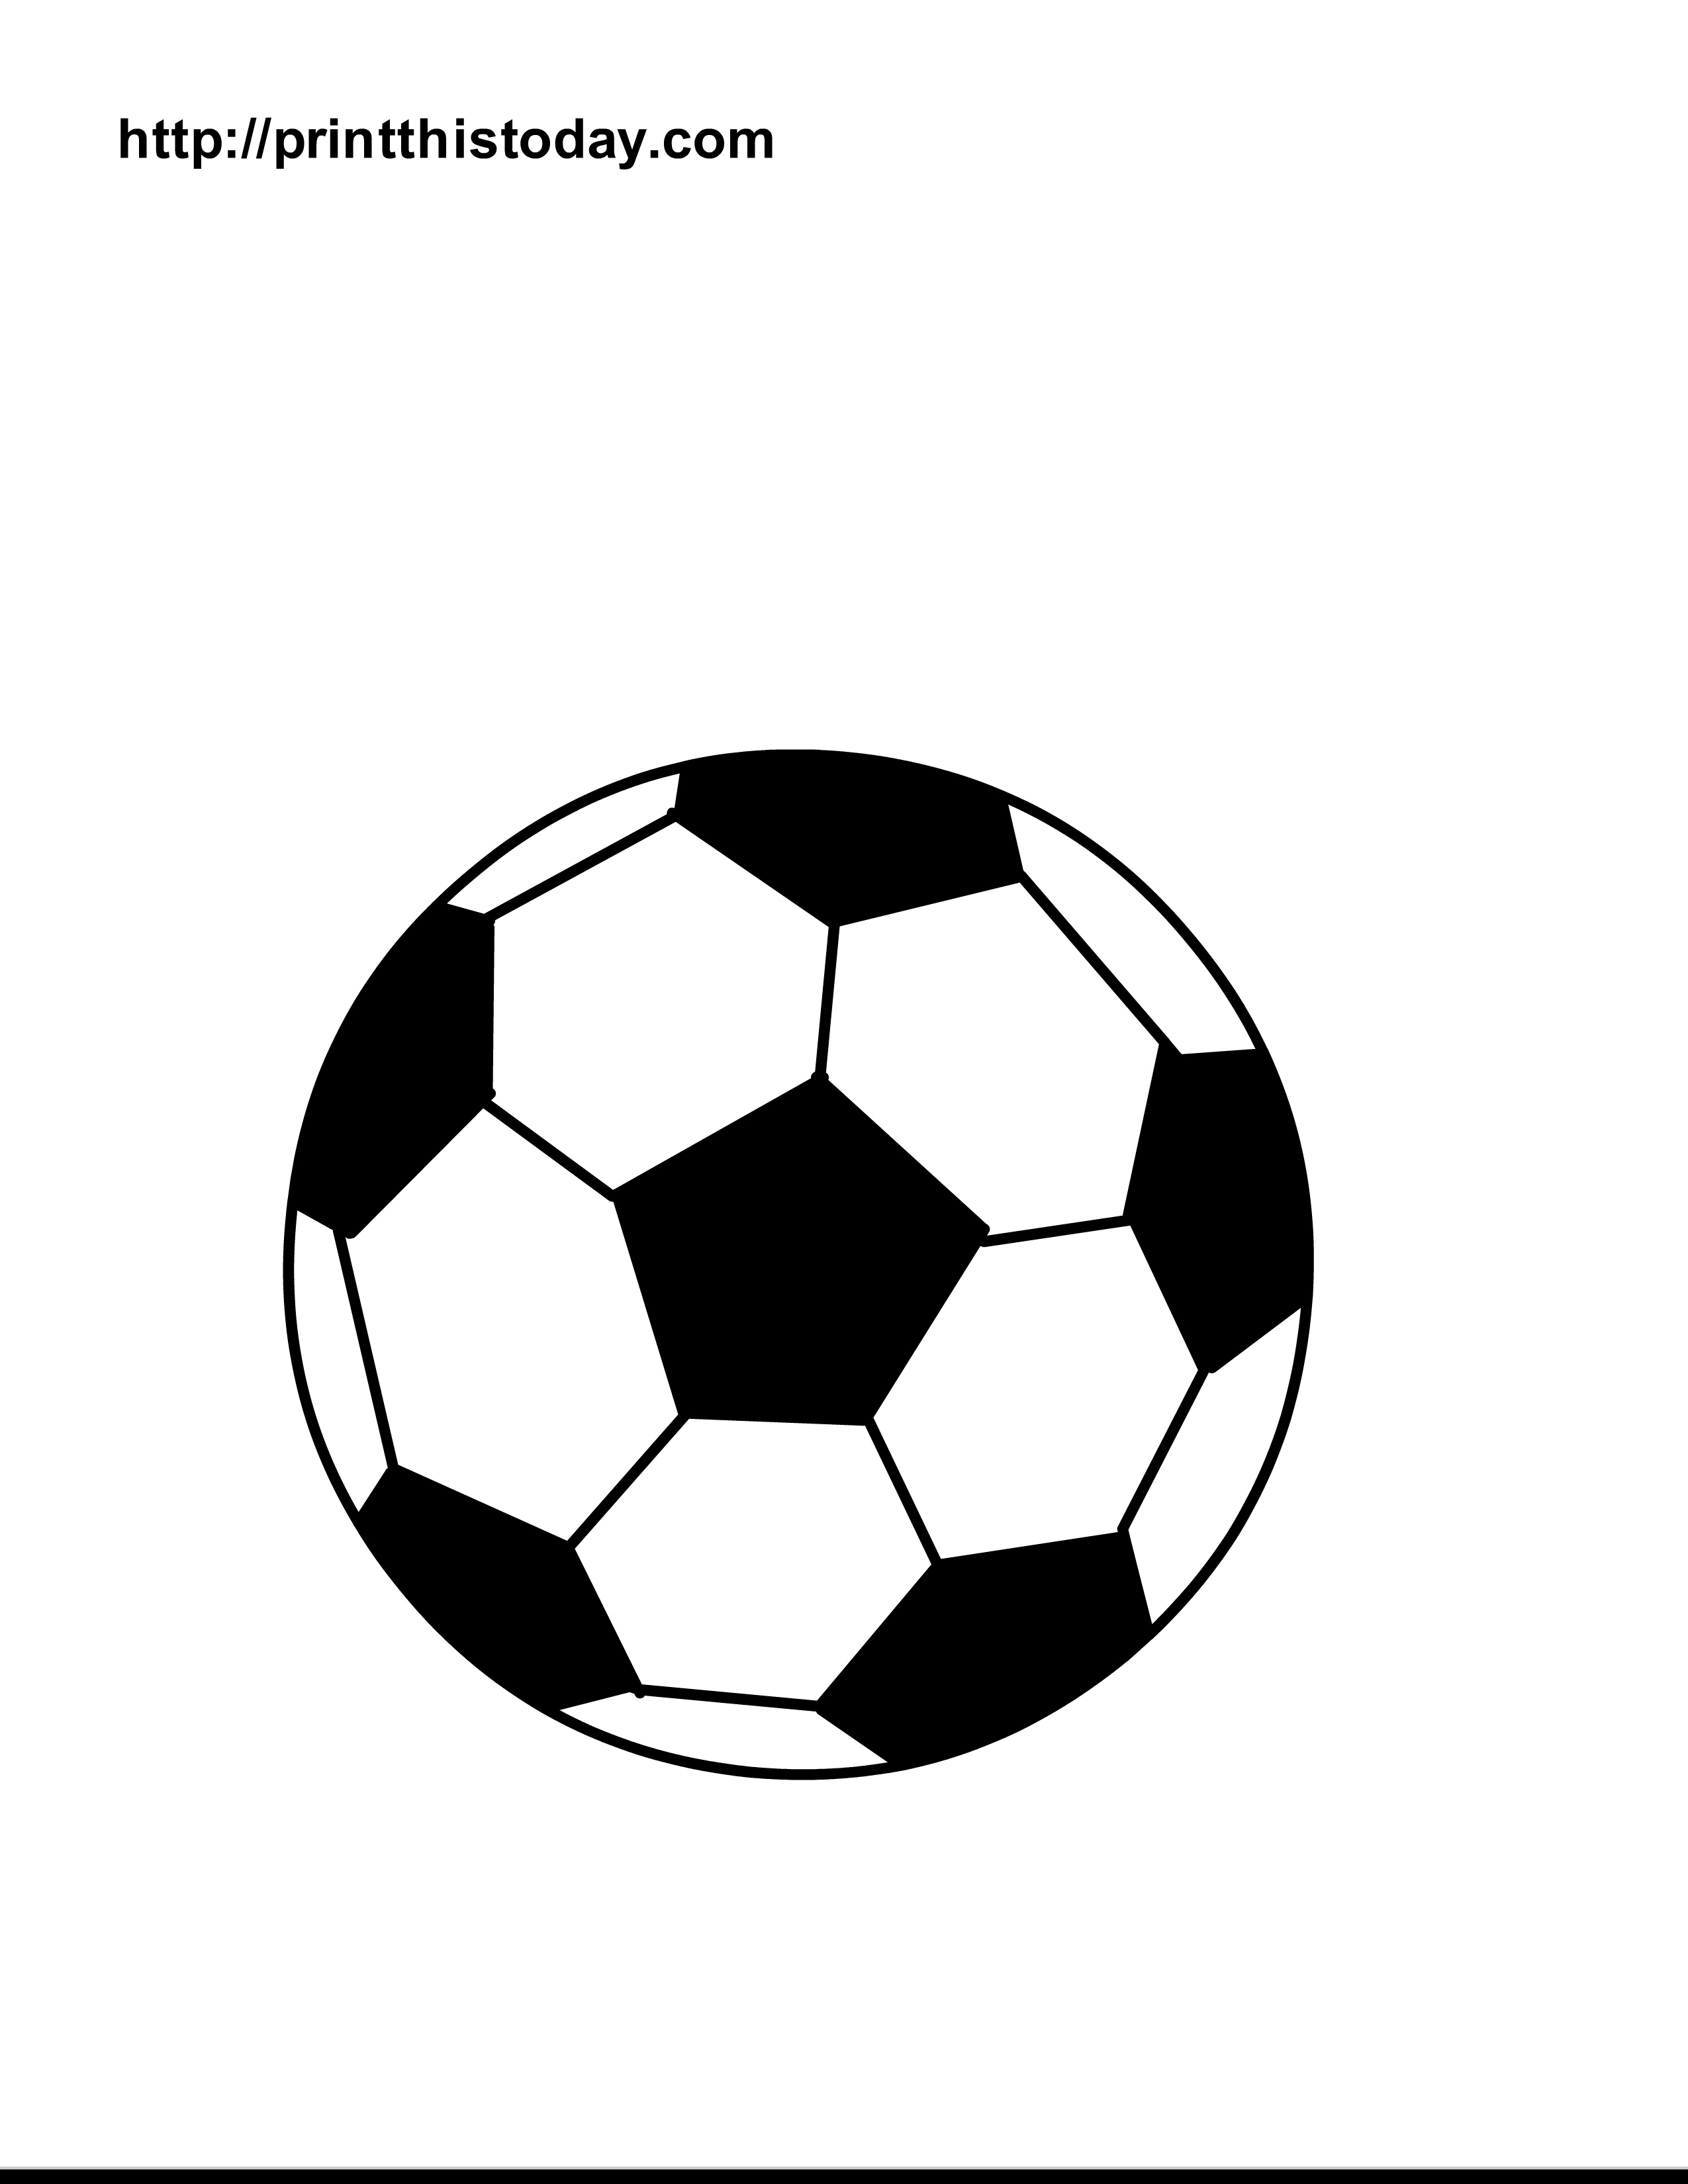 2550x3300 Soccer Ball Coloring Page Elegant Free Printable Sports Balls